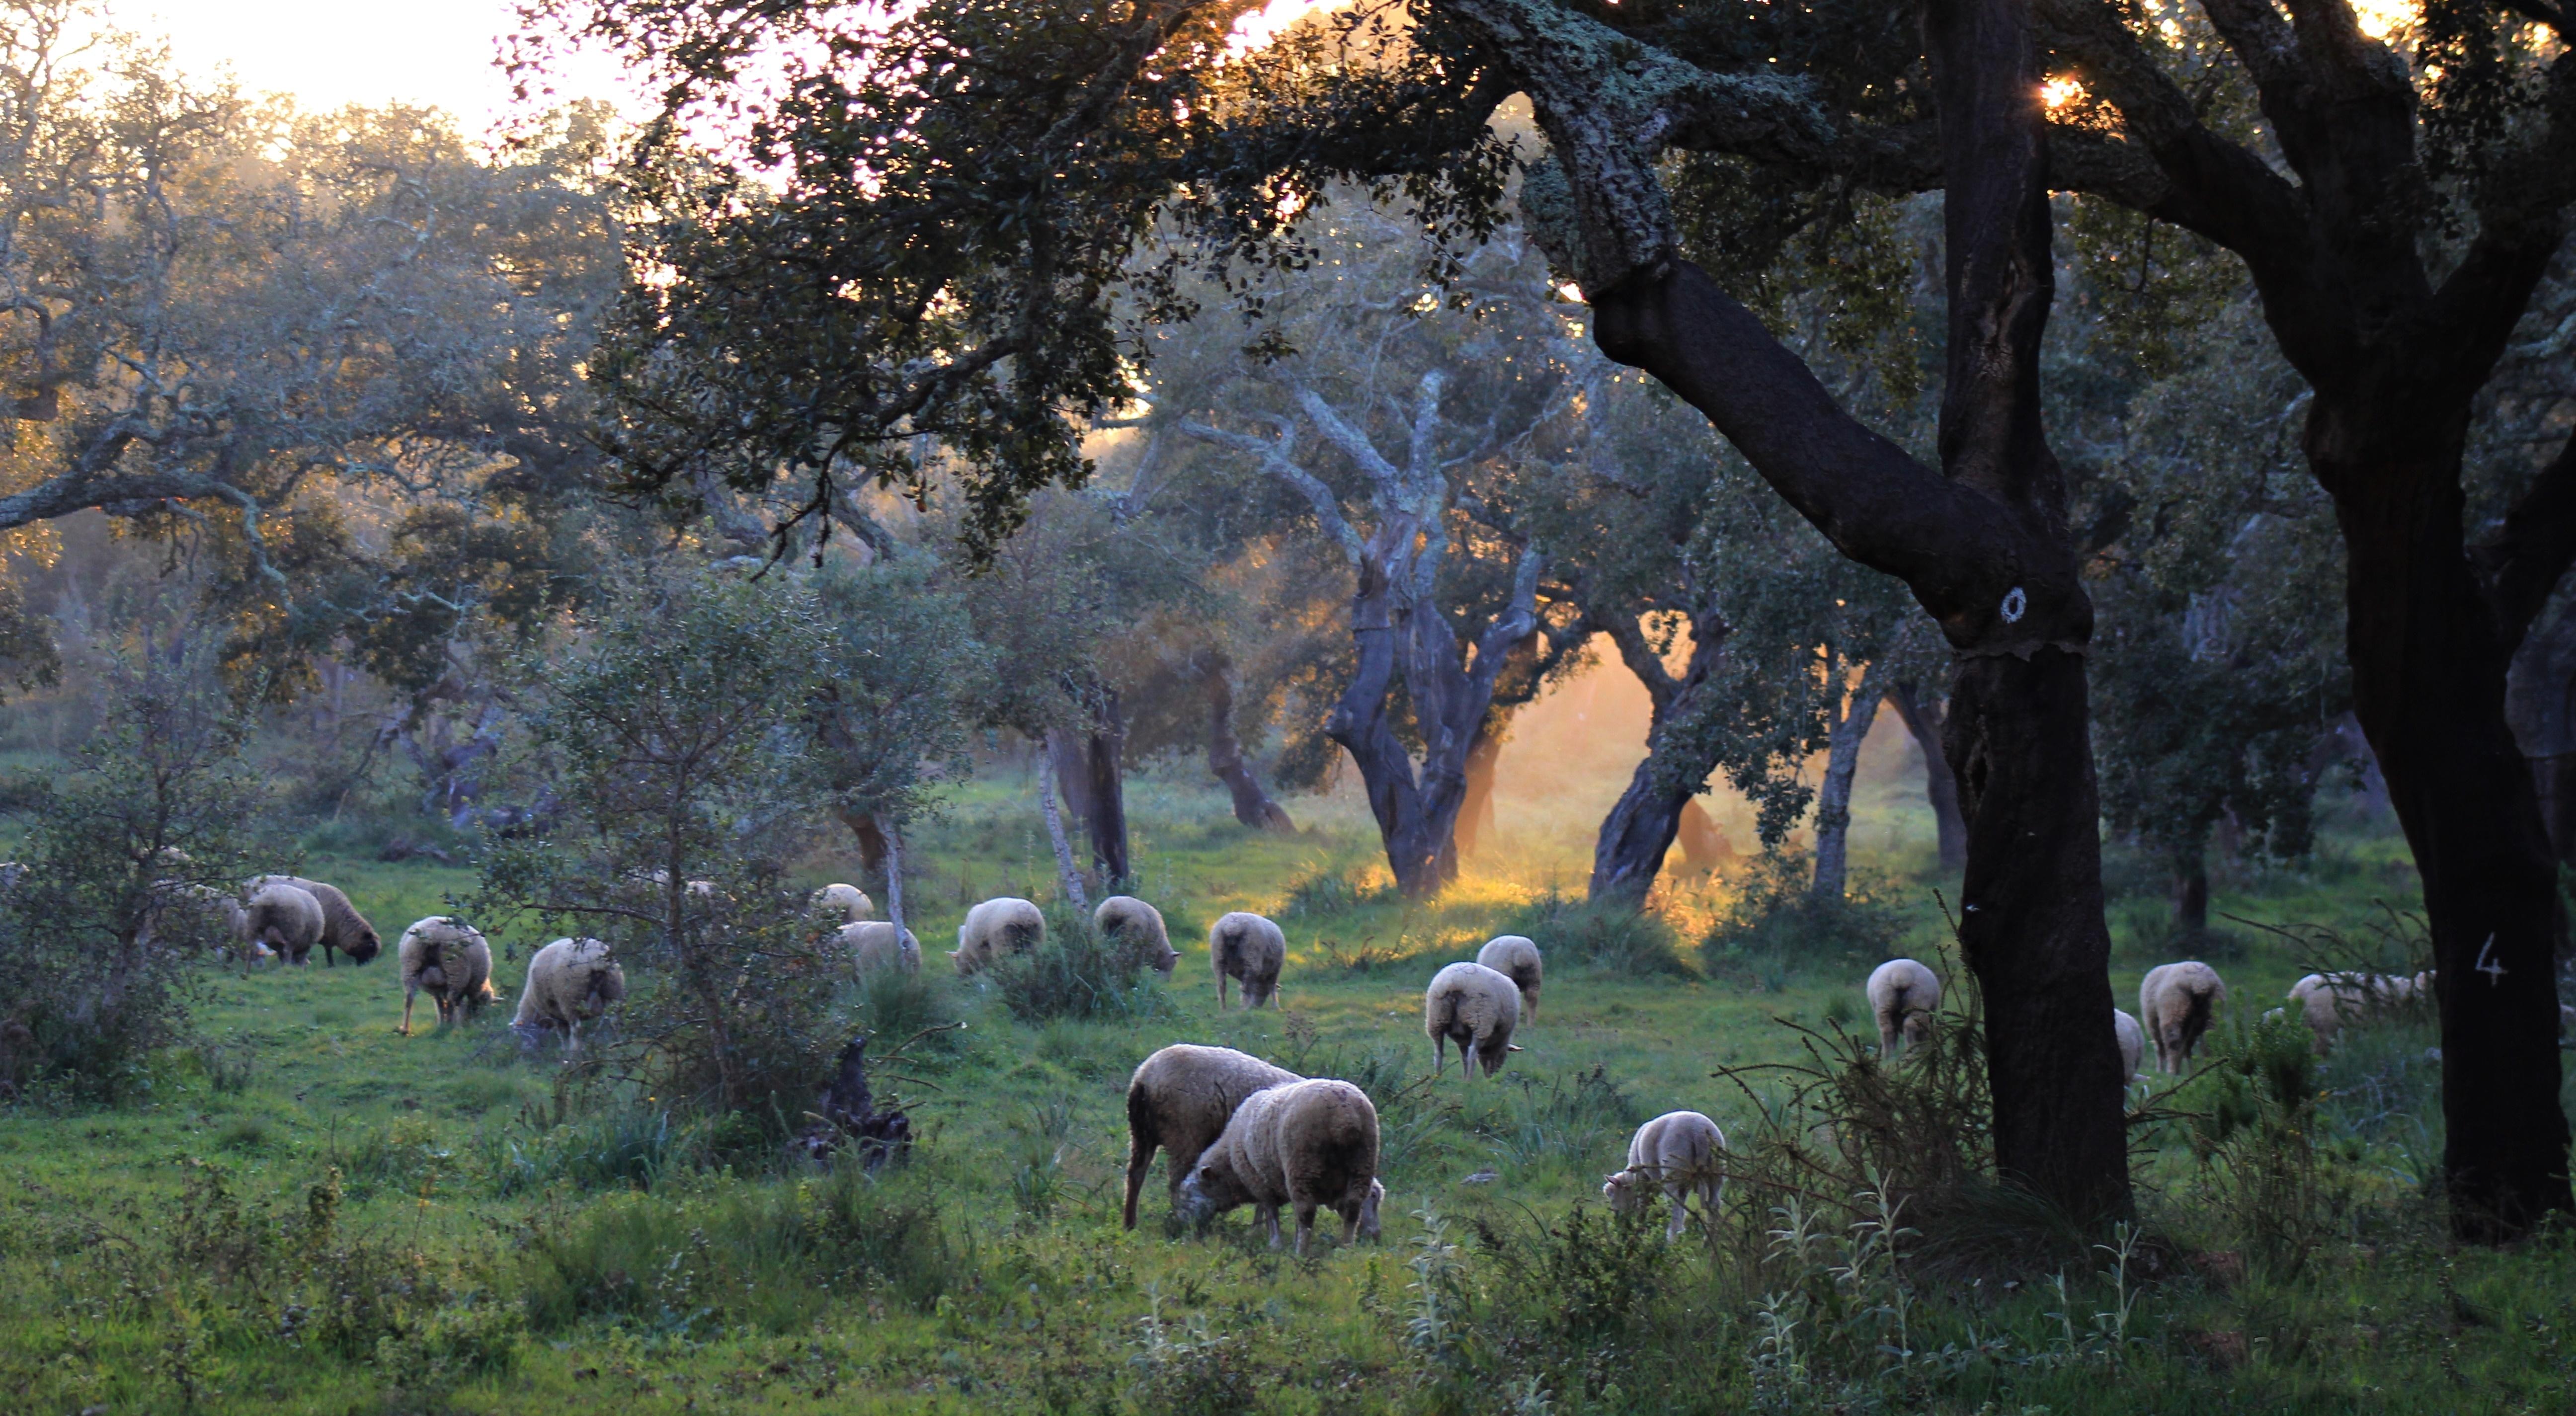 Grazing sheep in the Alentejo